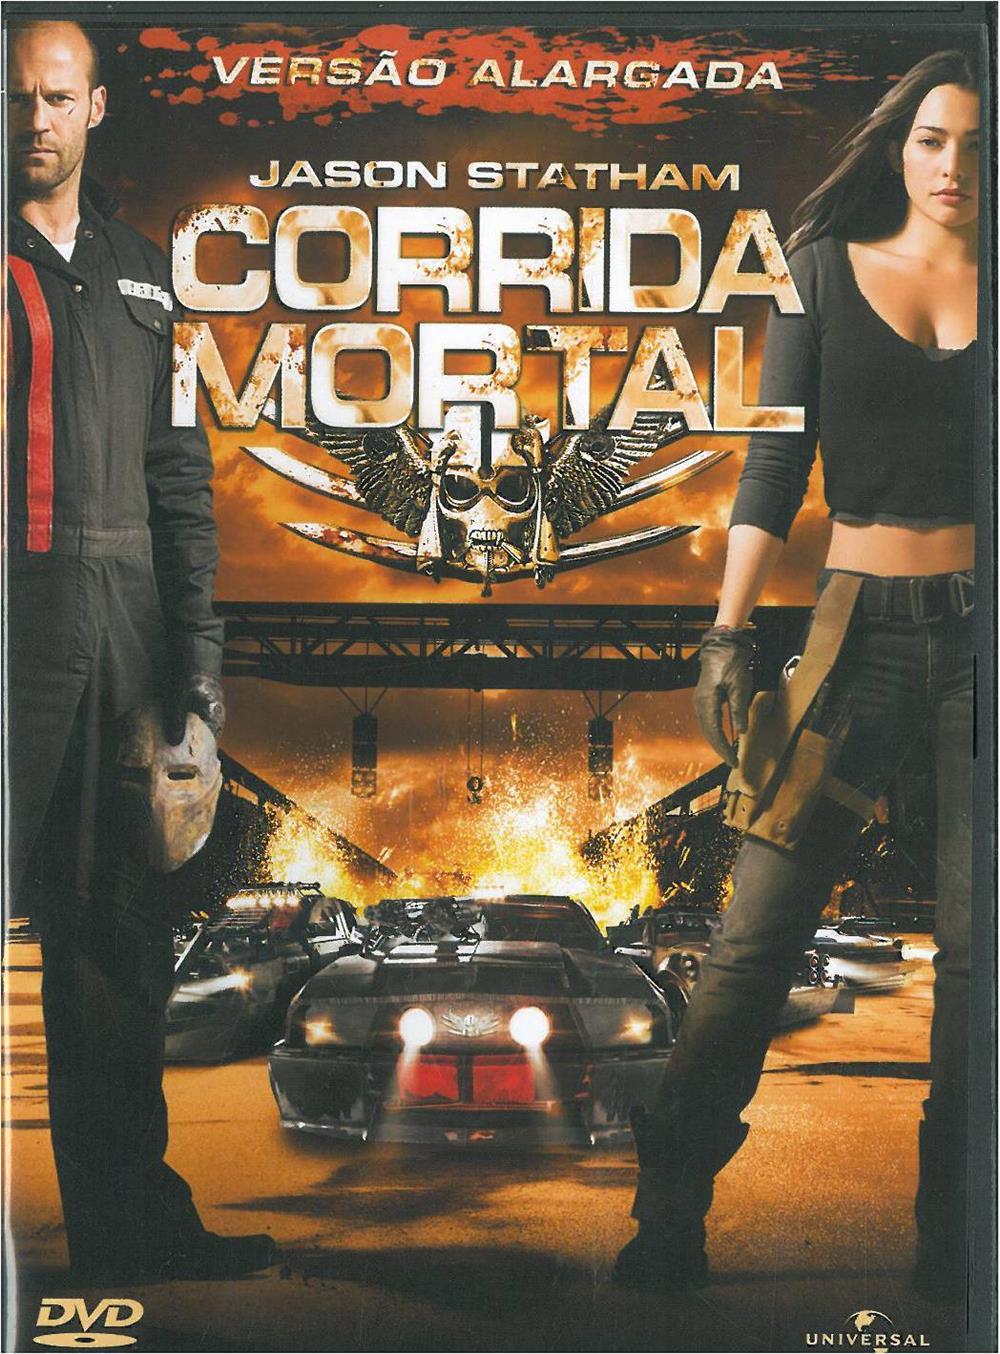 Corrida mortal_DVD.jpg